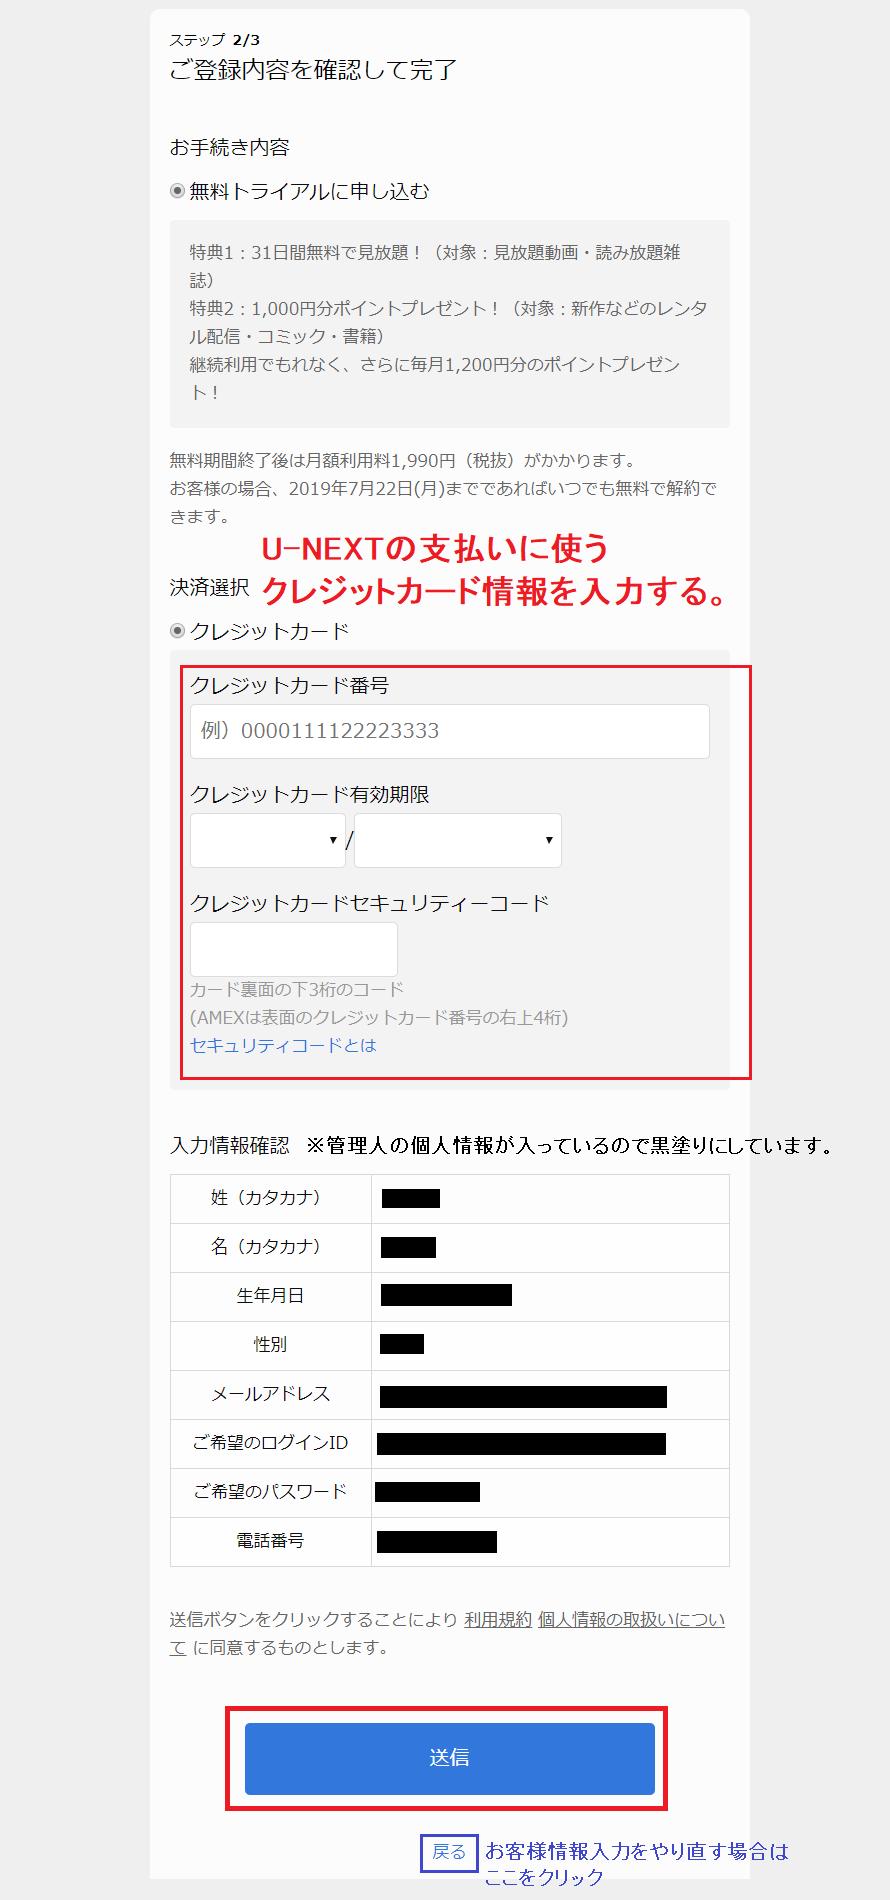 U-NEXT_入会登録ステップ2_登録内容確認とクレジットカード情報入力